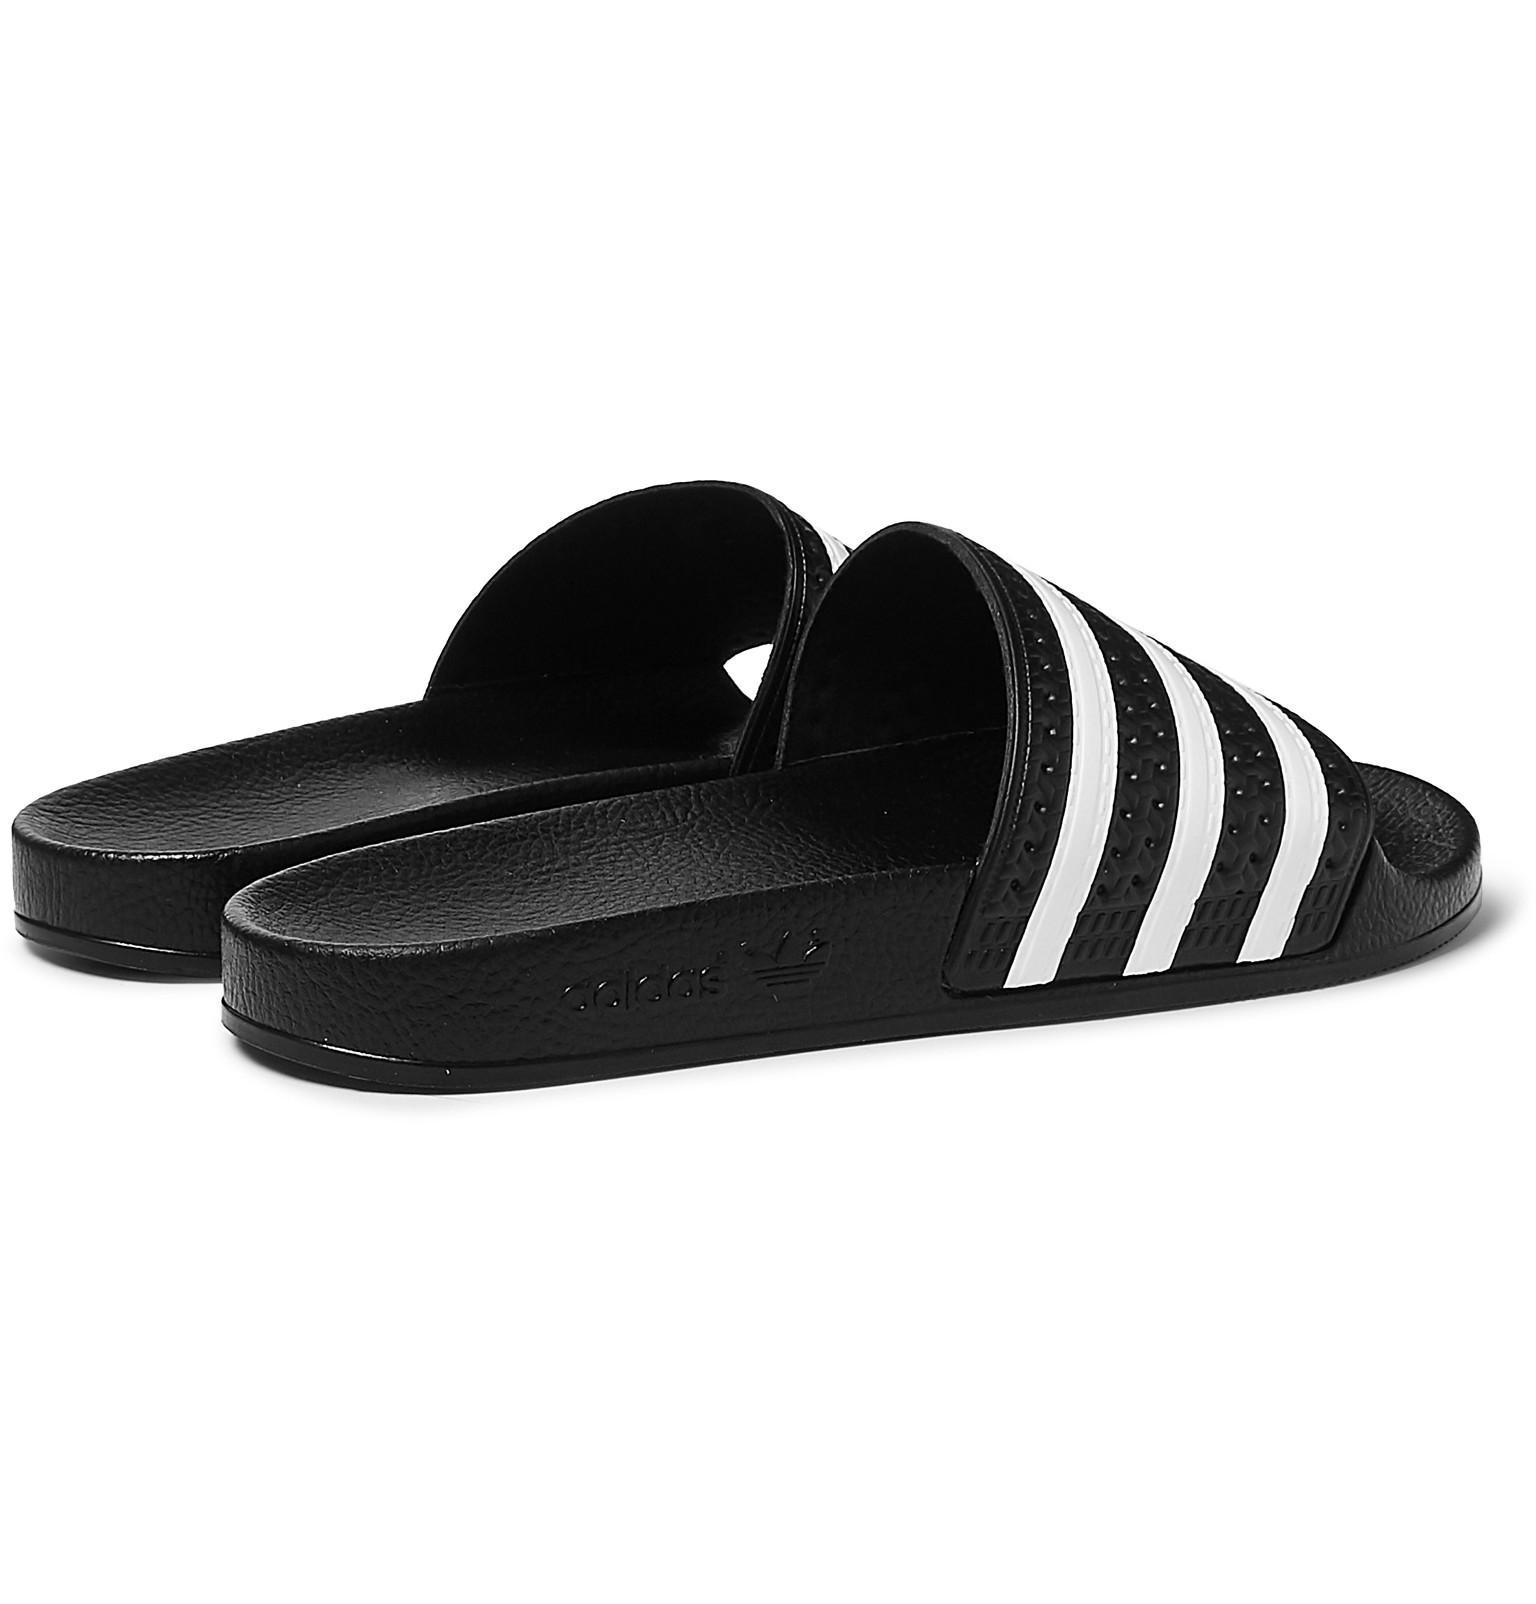 9a0c715dd9e43e Adidas Originals - Black Adilette Textured-rubber Slides for Men - Lyst.  View fullscreen